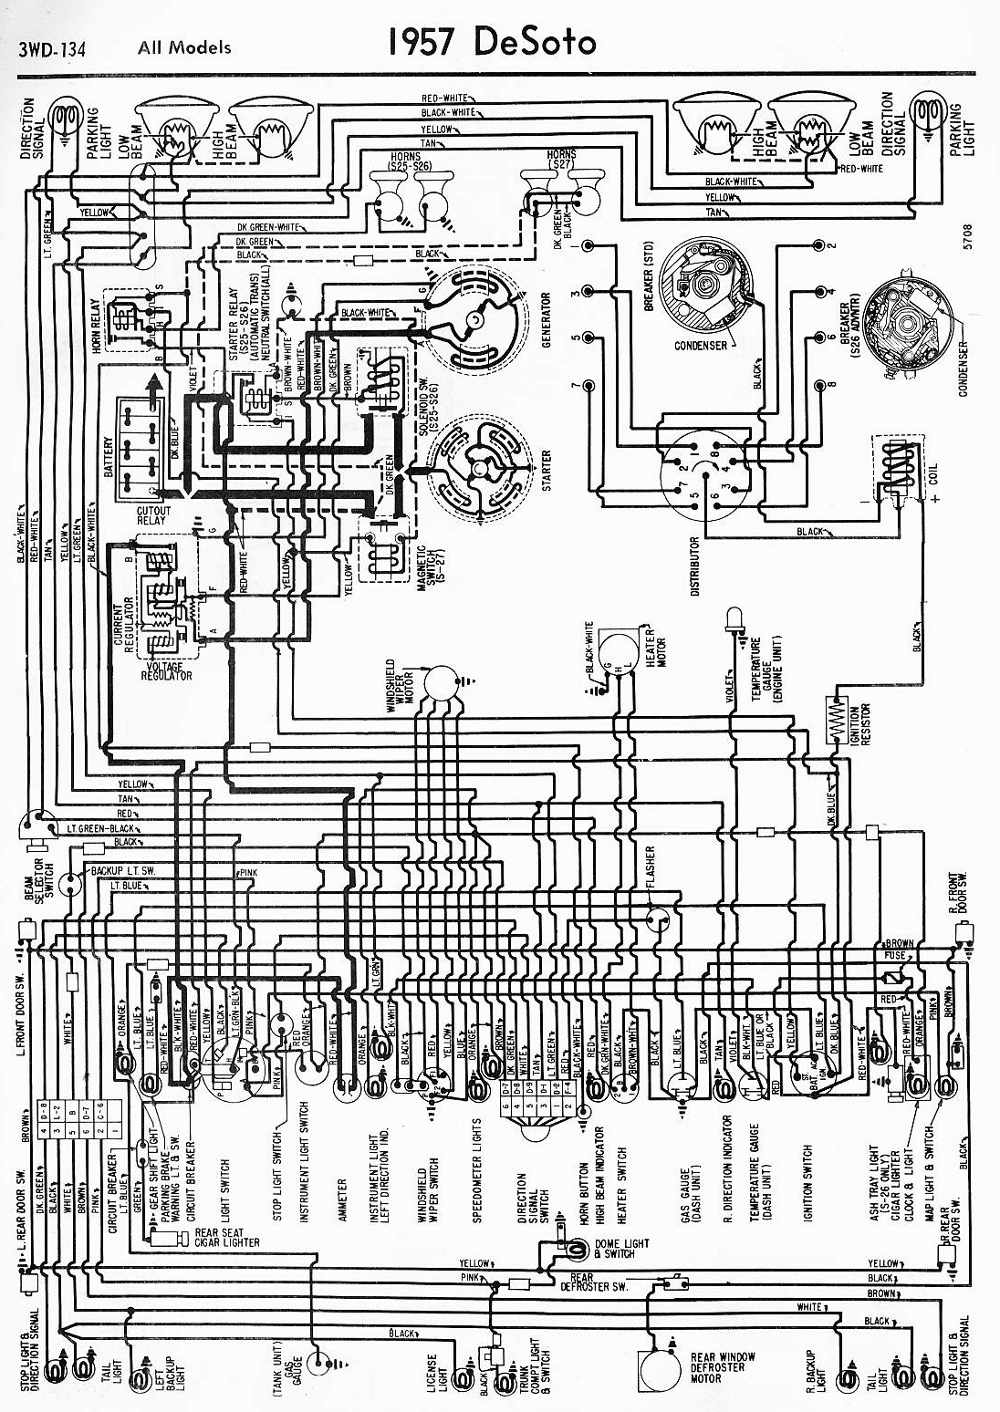 Enchanting Boat Gas Gauge Wiring Diagram Mold - Wiring Diagram Ideas ...